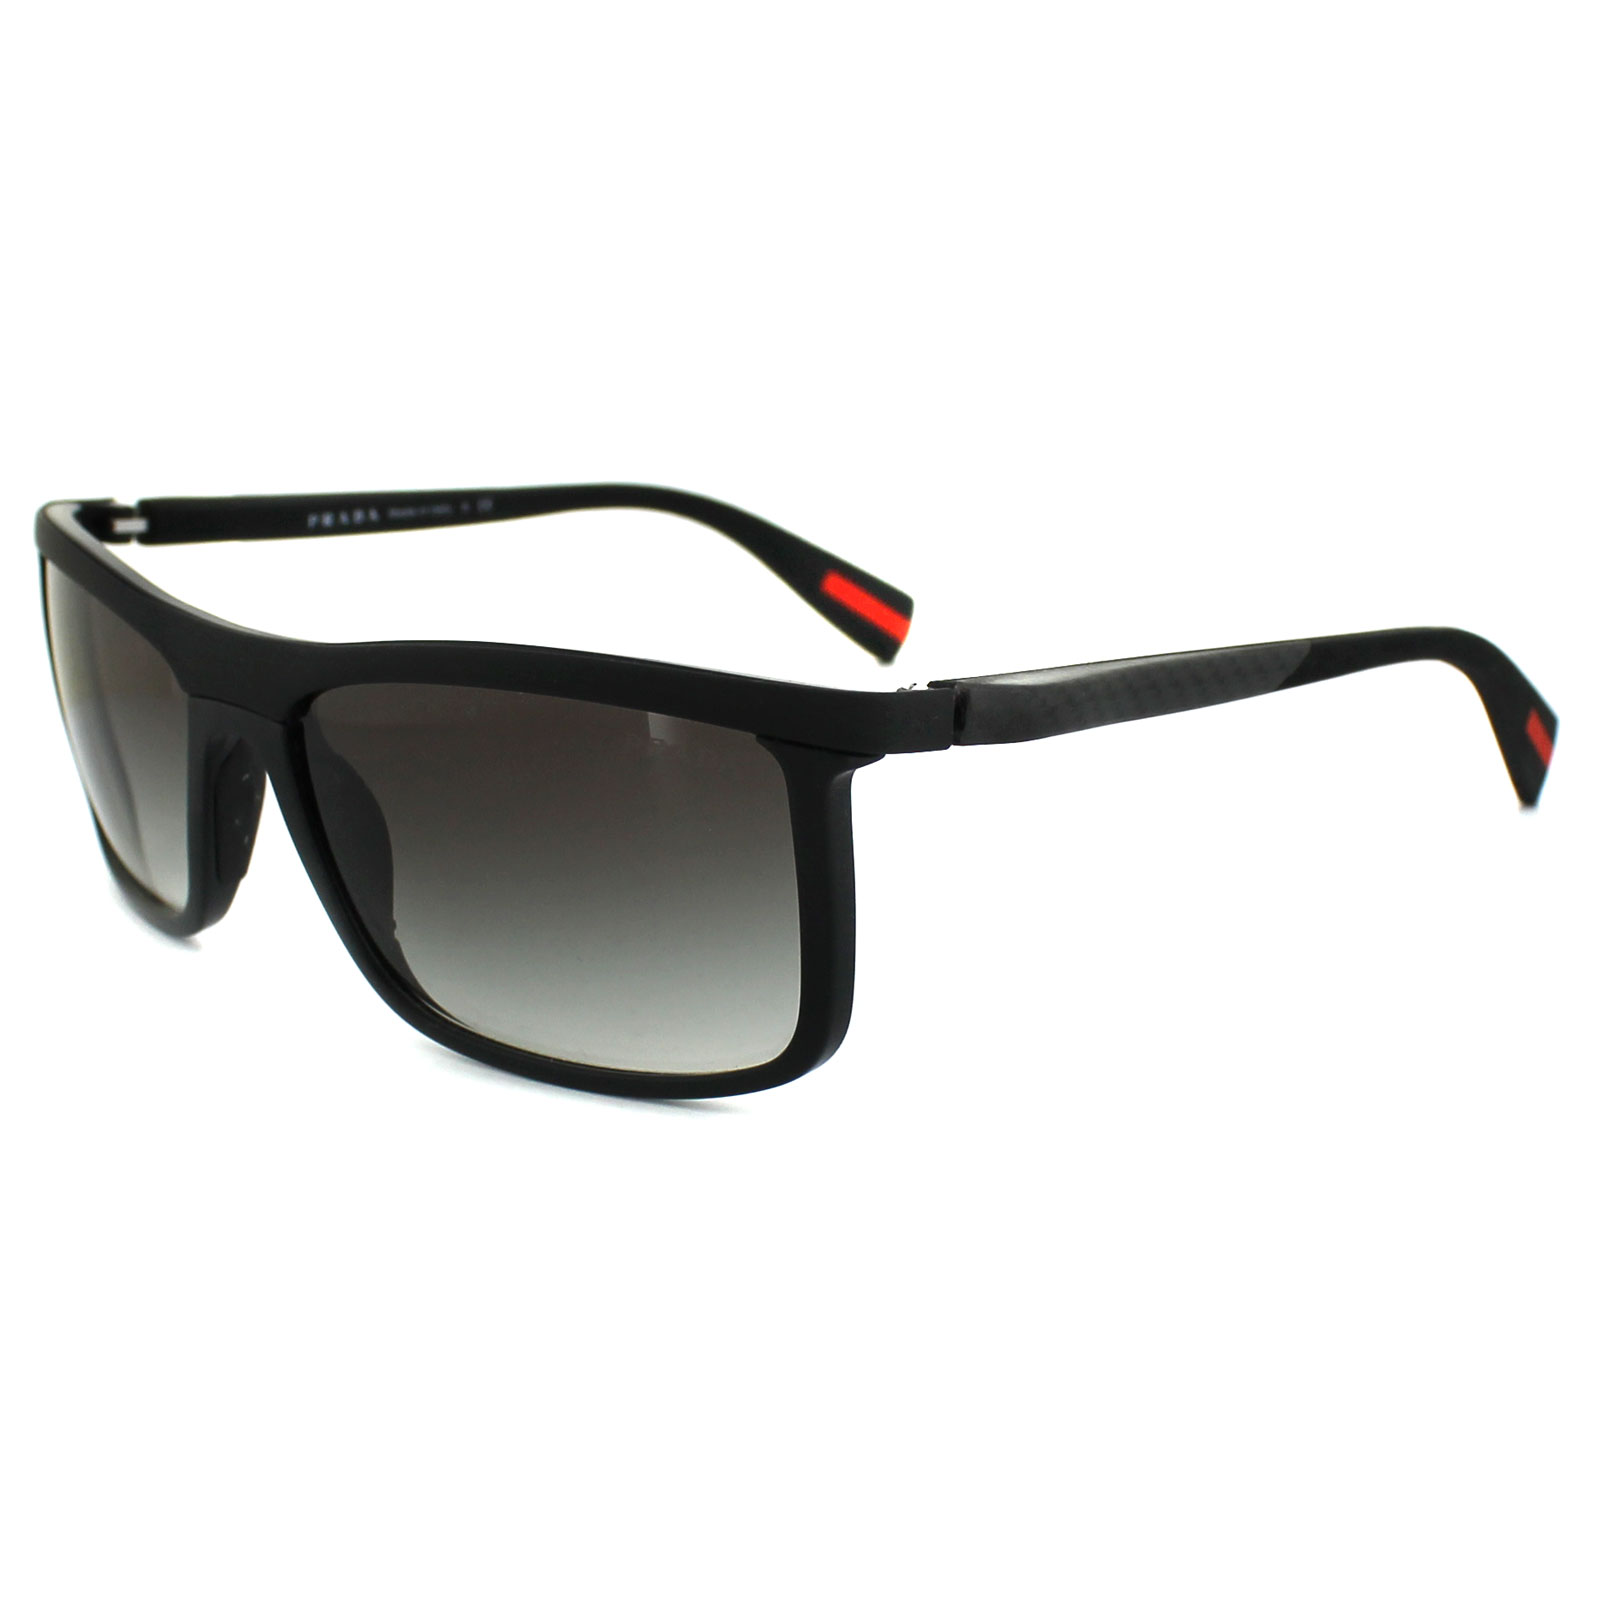 cheap prada sport 51ps sunglasses discounted sunglasses. Black Bedroom Furniture Sets. Home Design Ideas